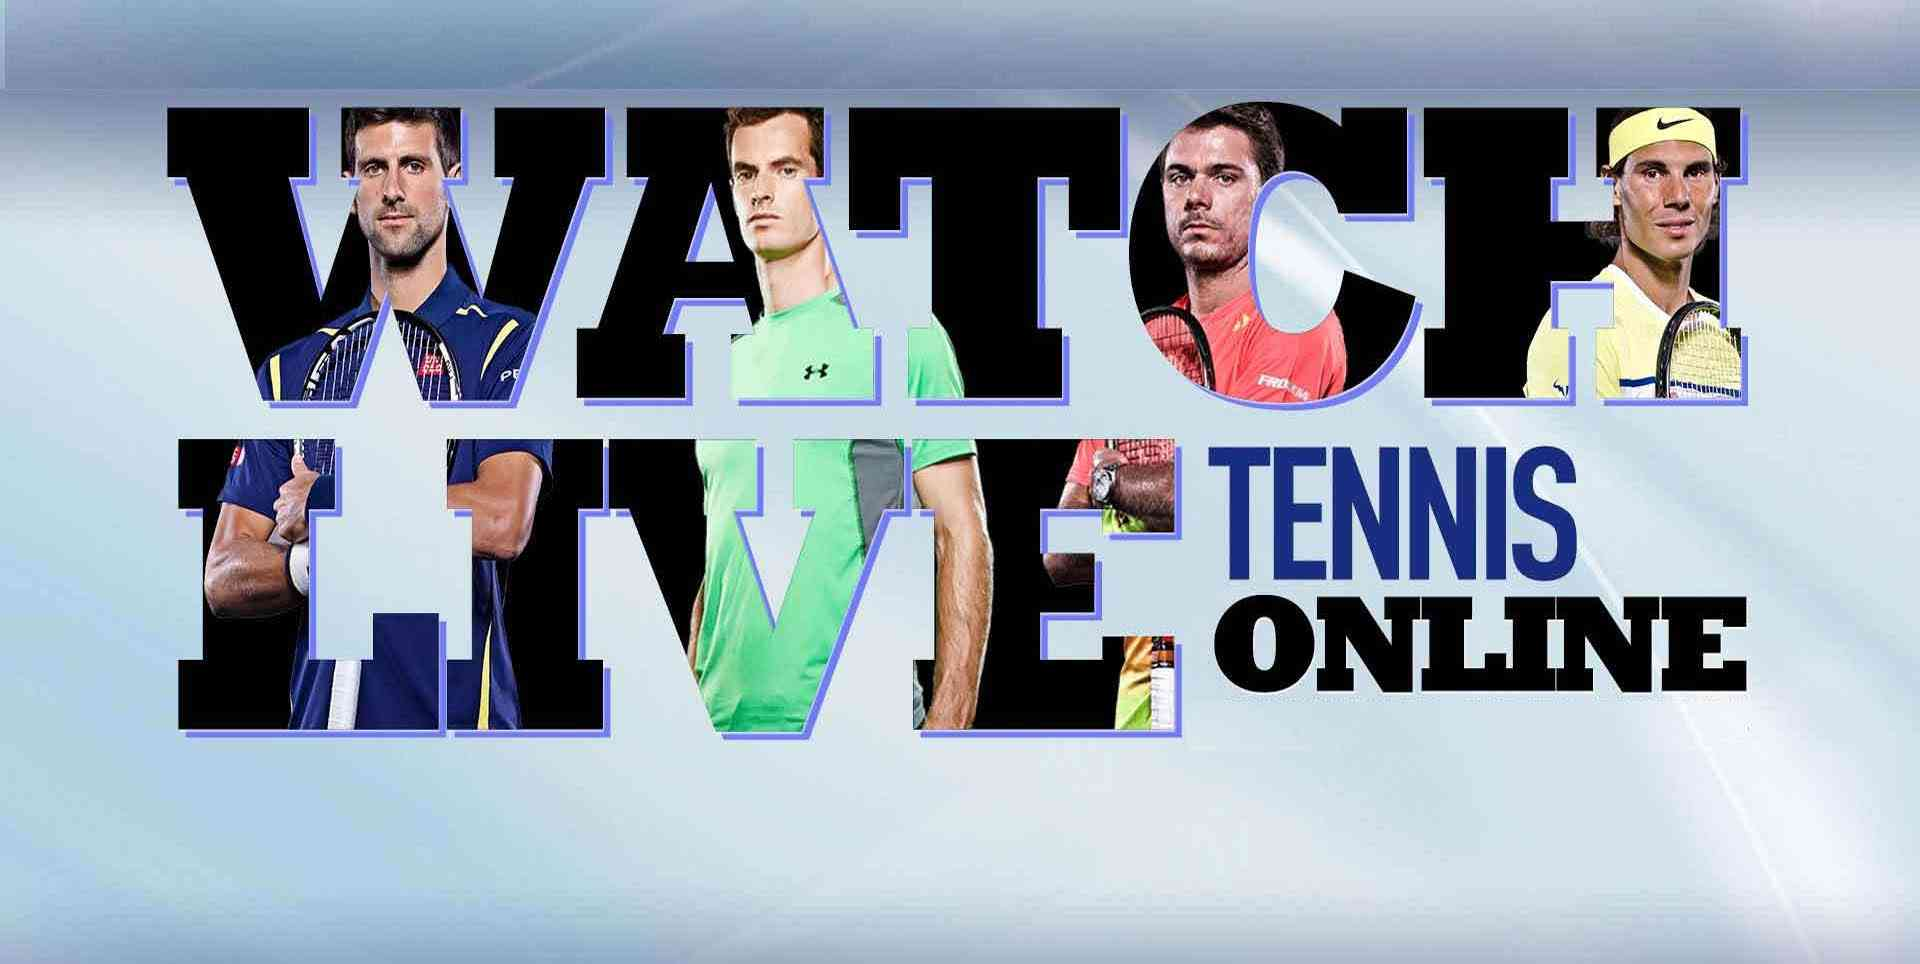 live-australian-open-2nd-singles-round-online